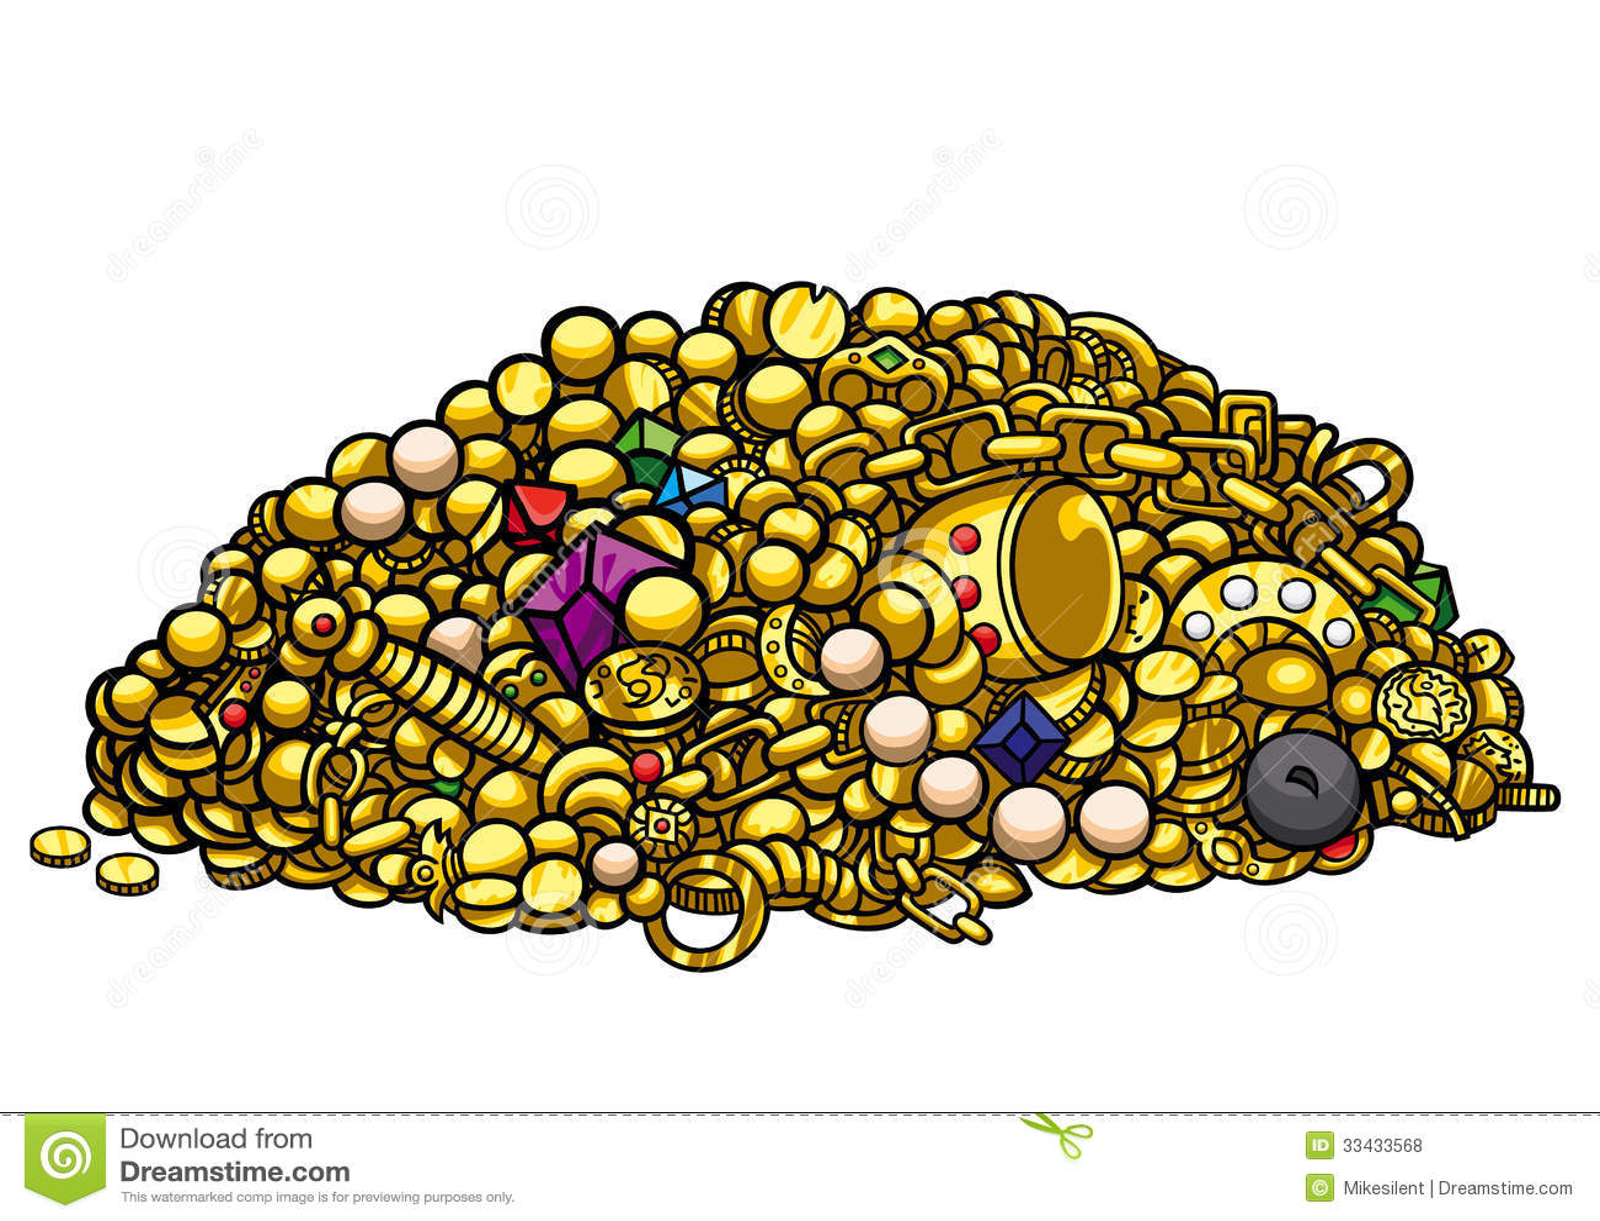 Gold nugget clip art